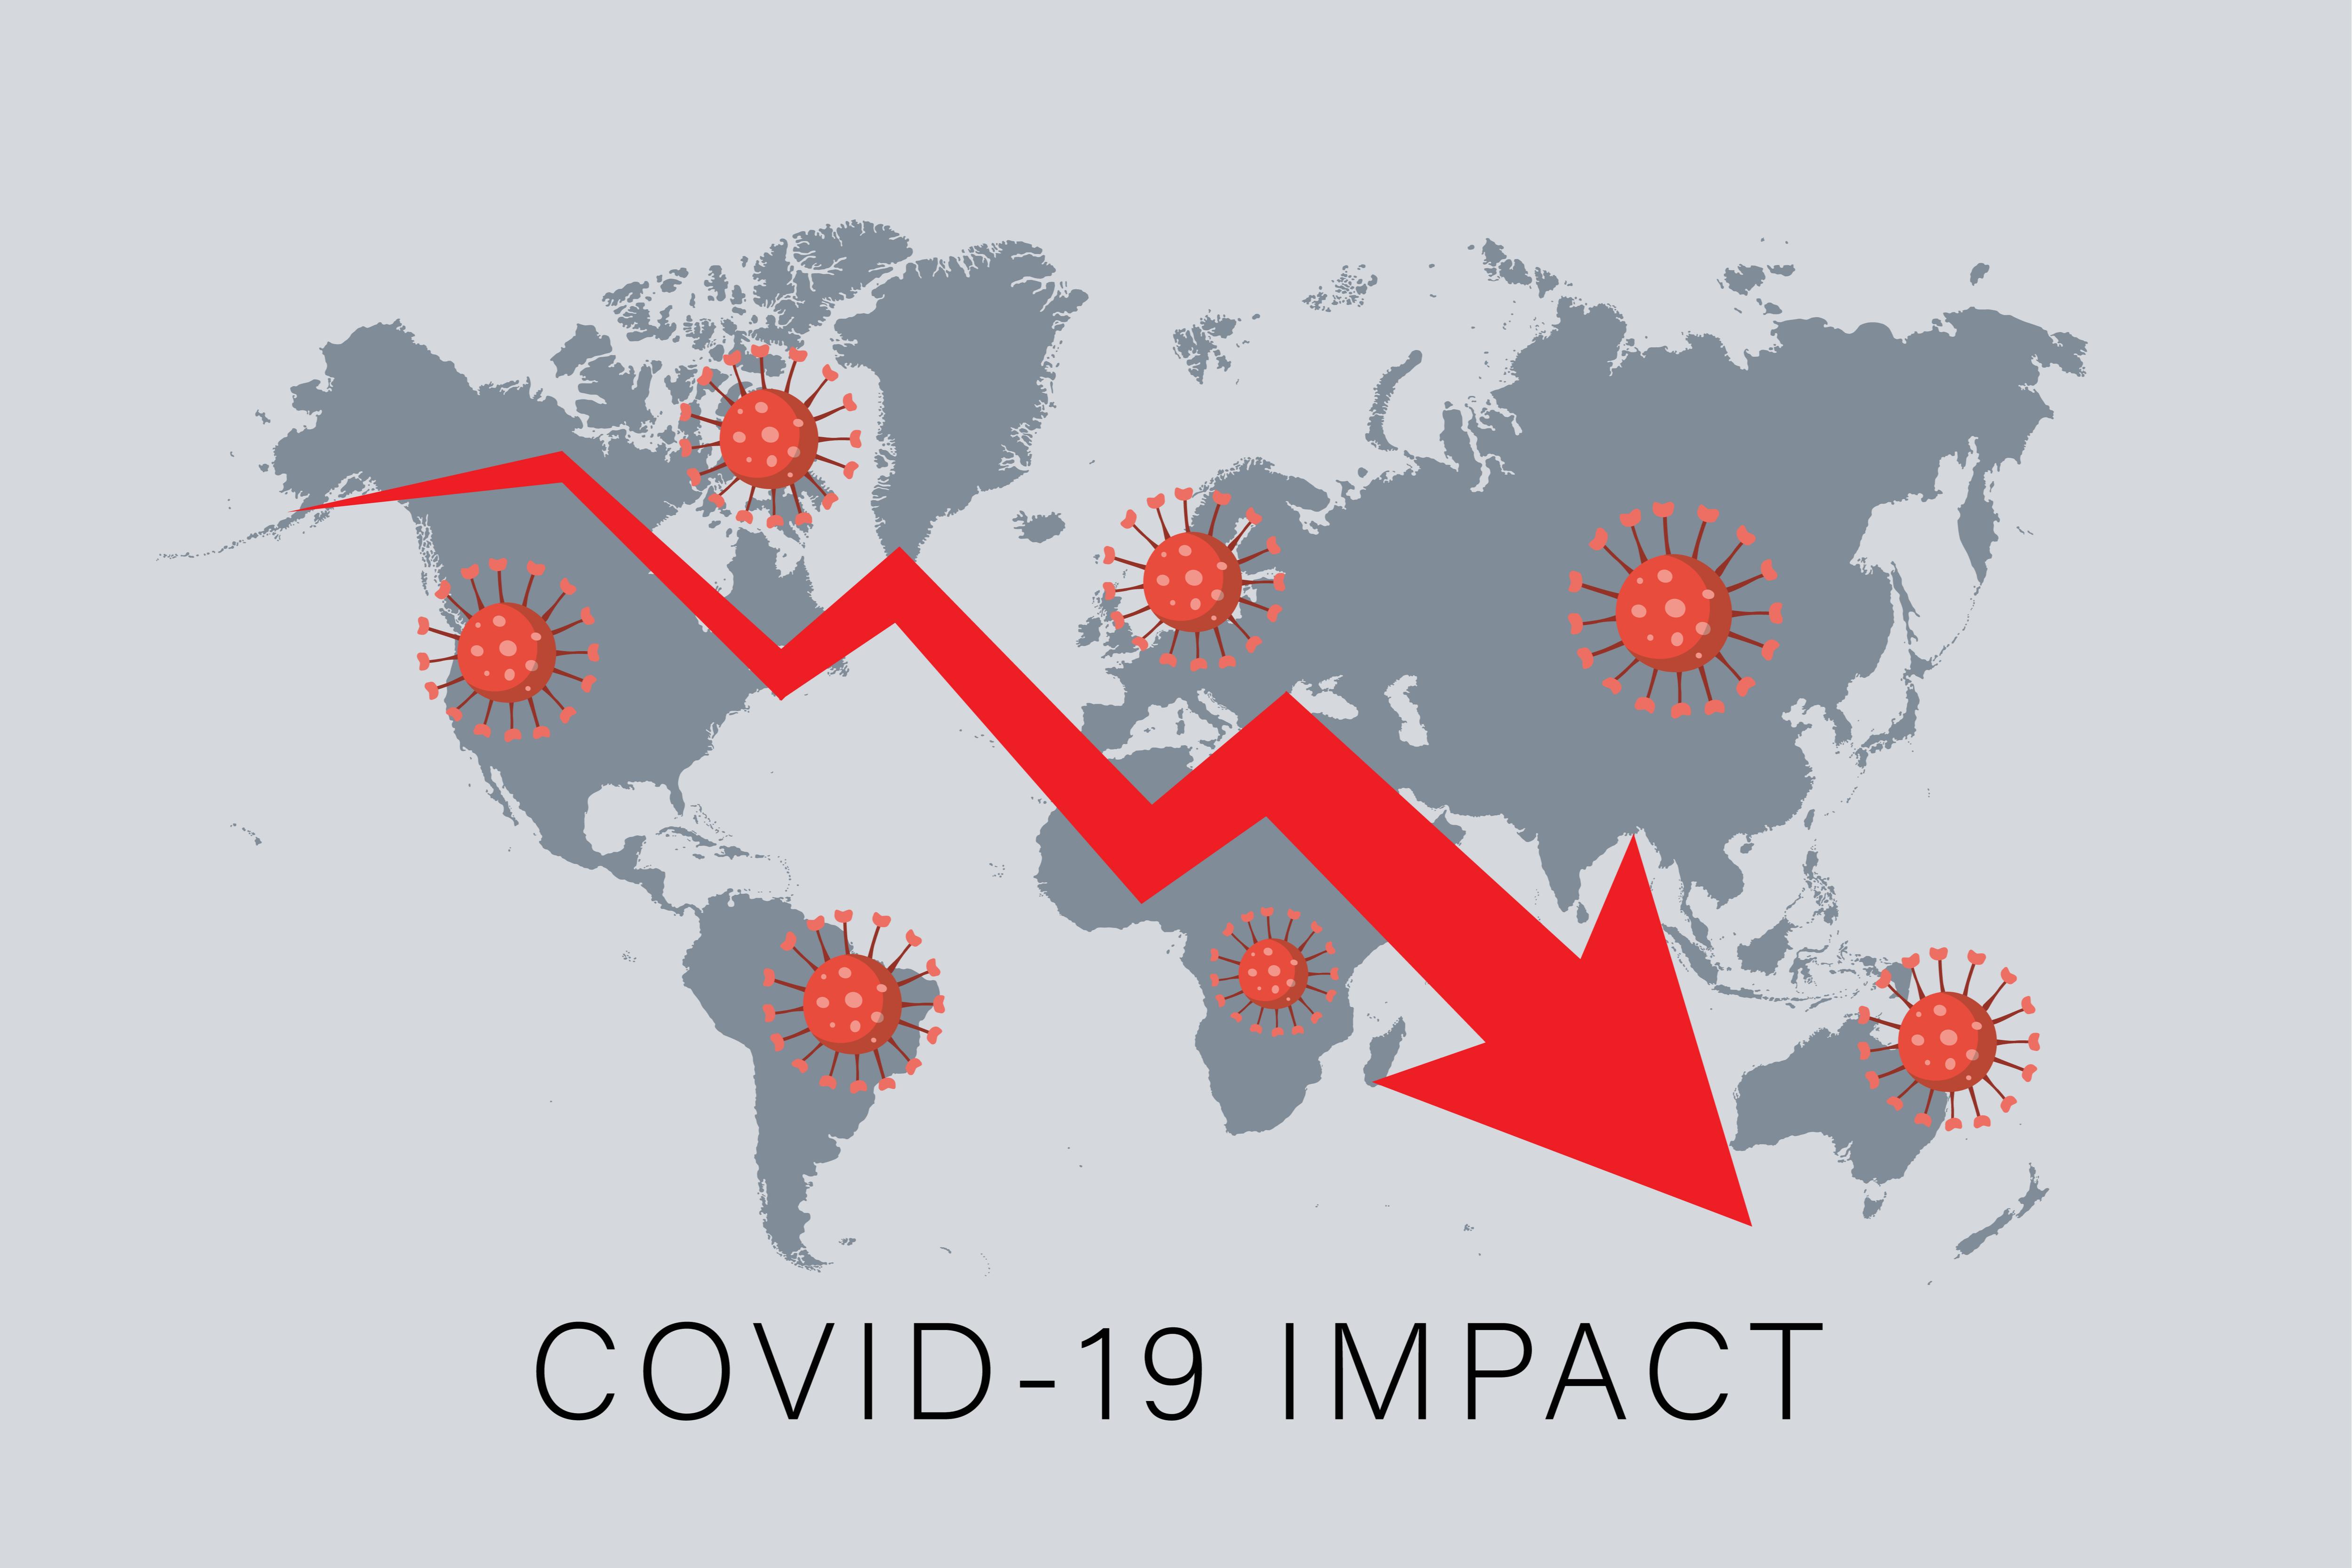 COVID-19 Temporary Visa Impact